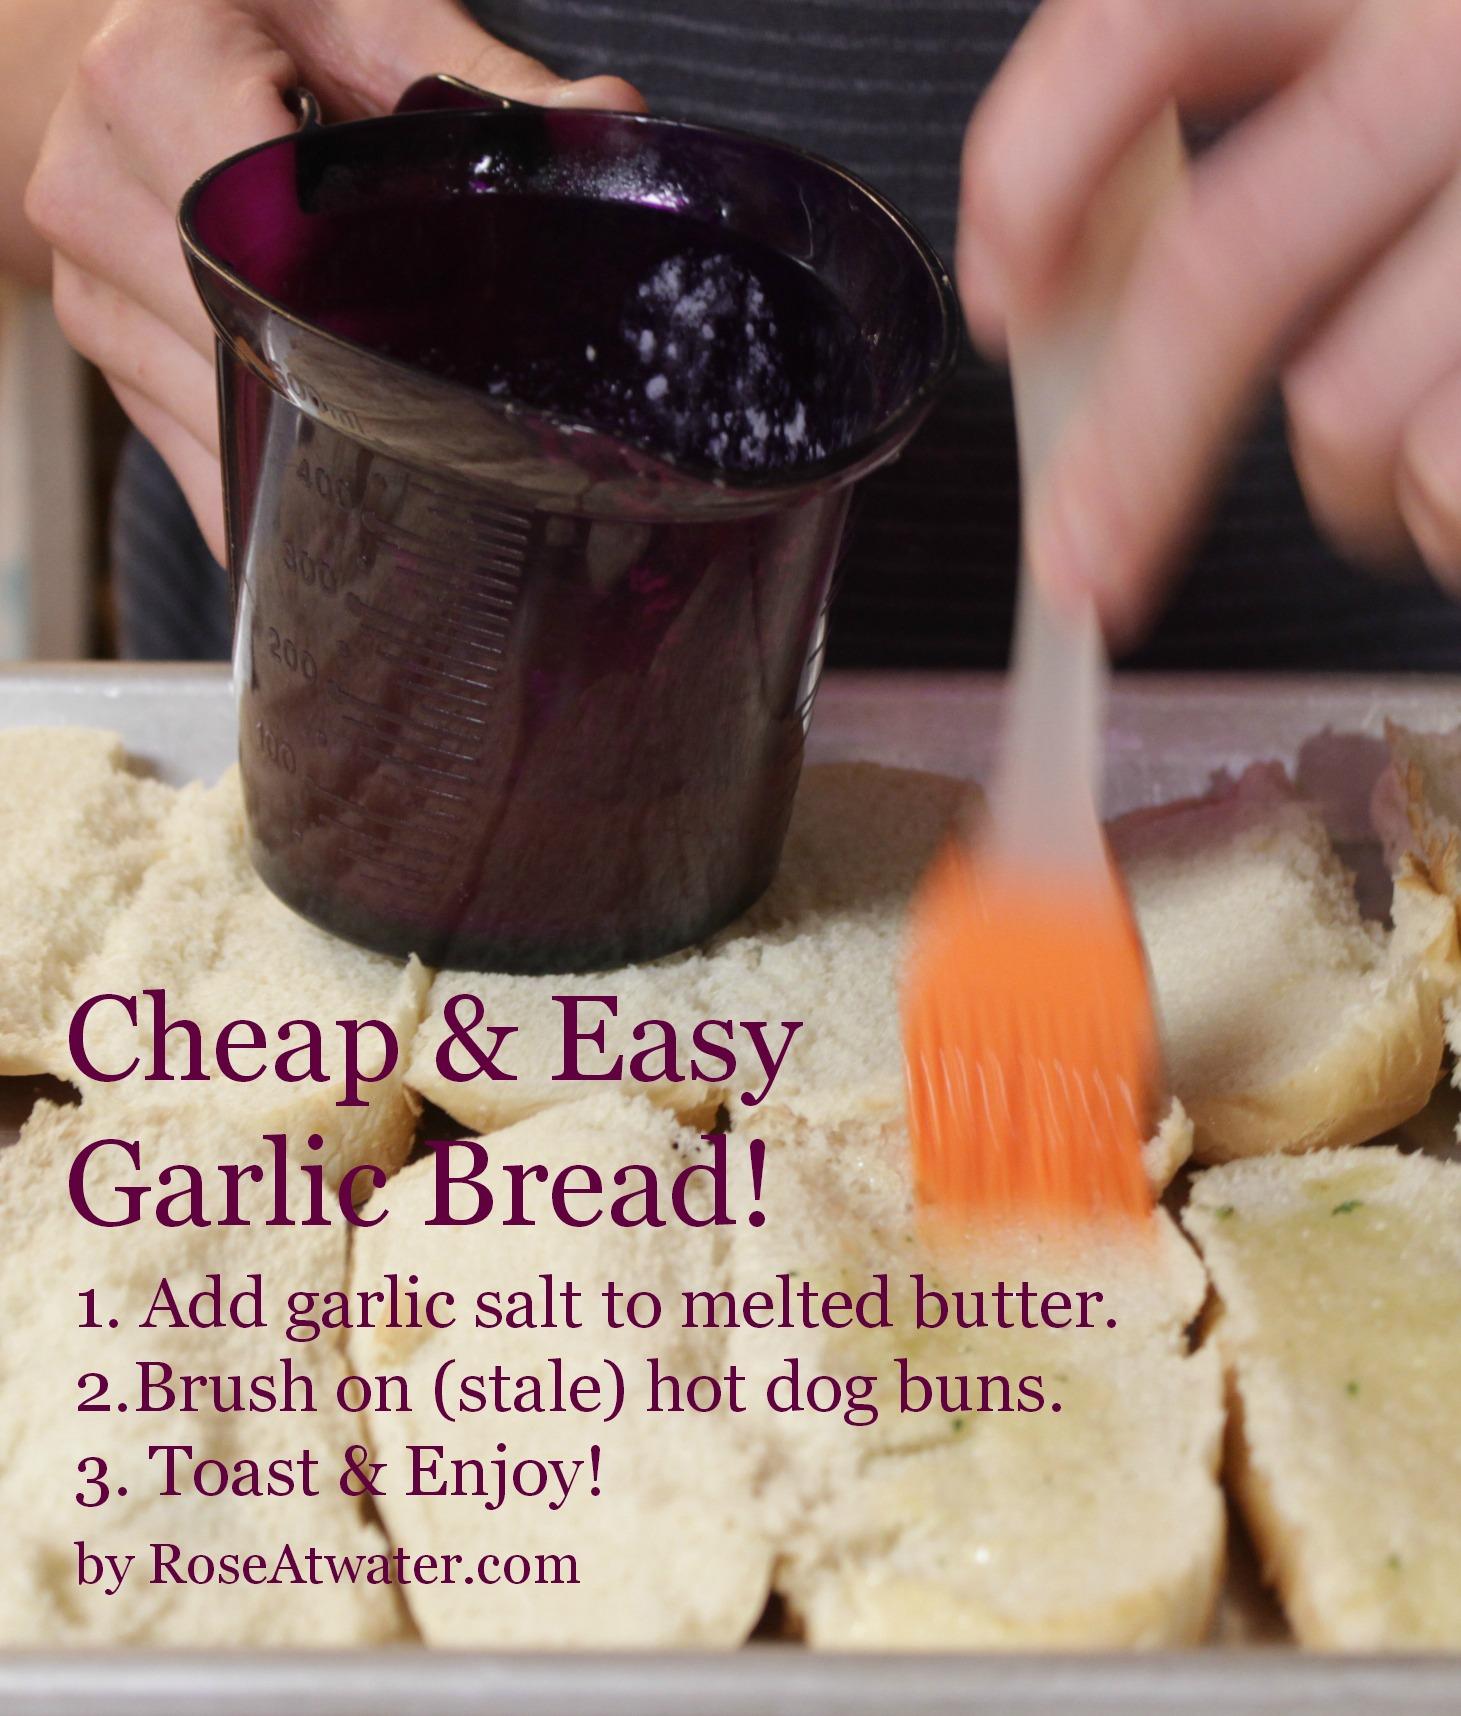 Cheap & Easy (Hot Dog Buns) Garlic Bread